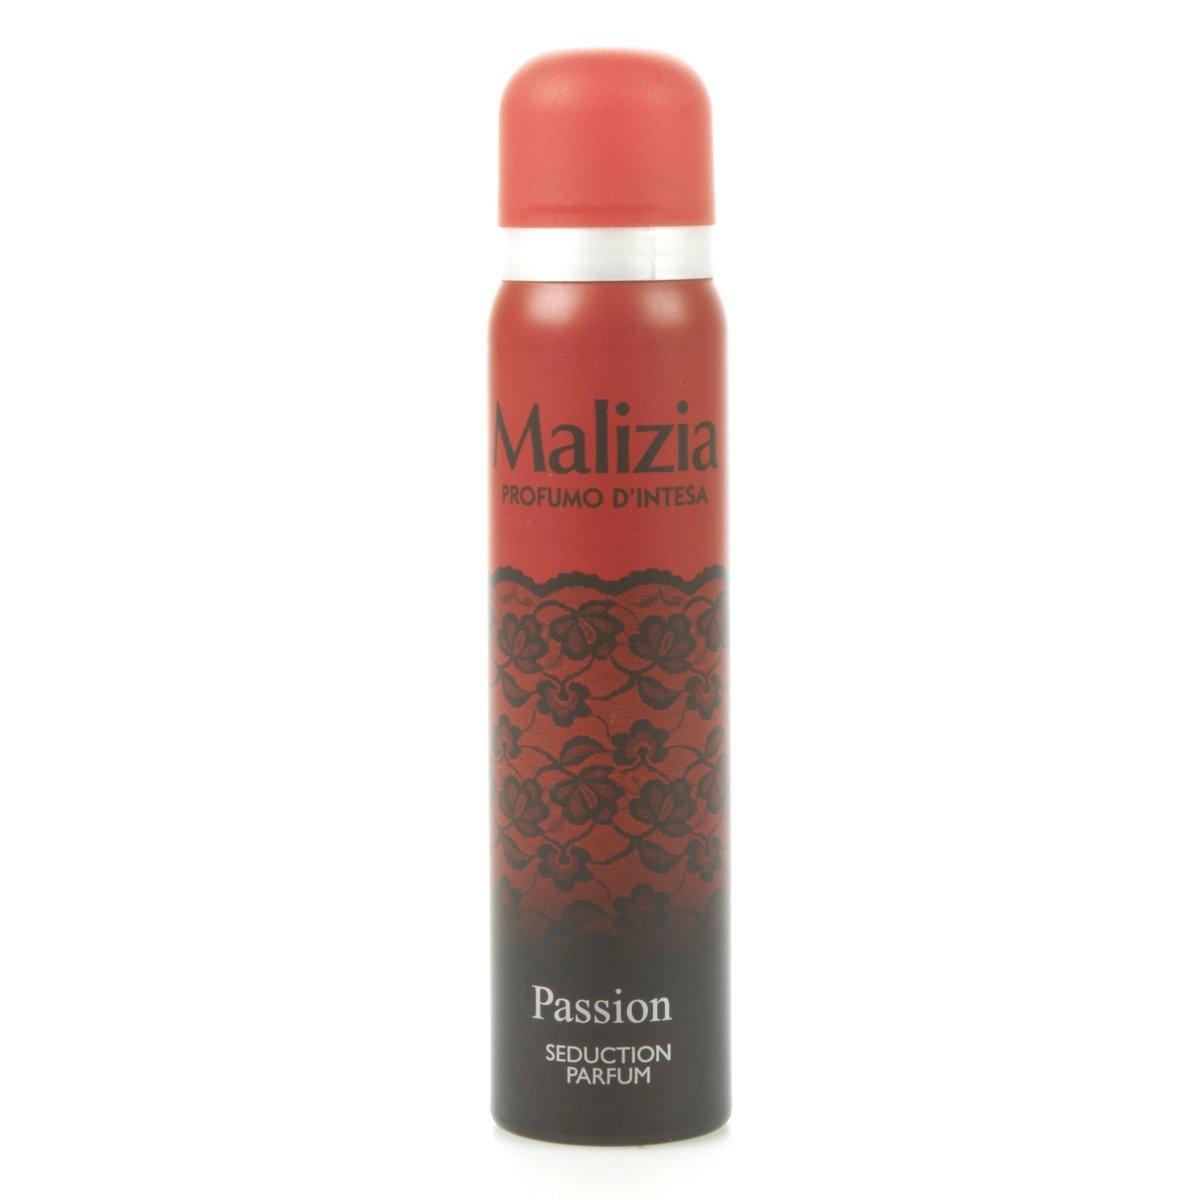 Malizia Seduction Parfum Passion